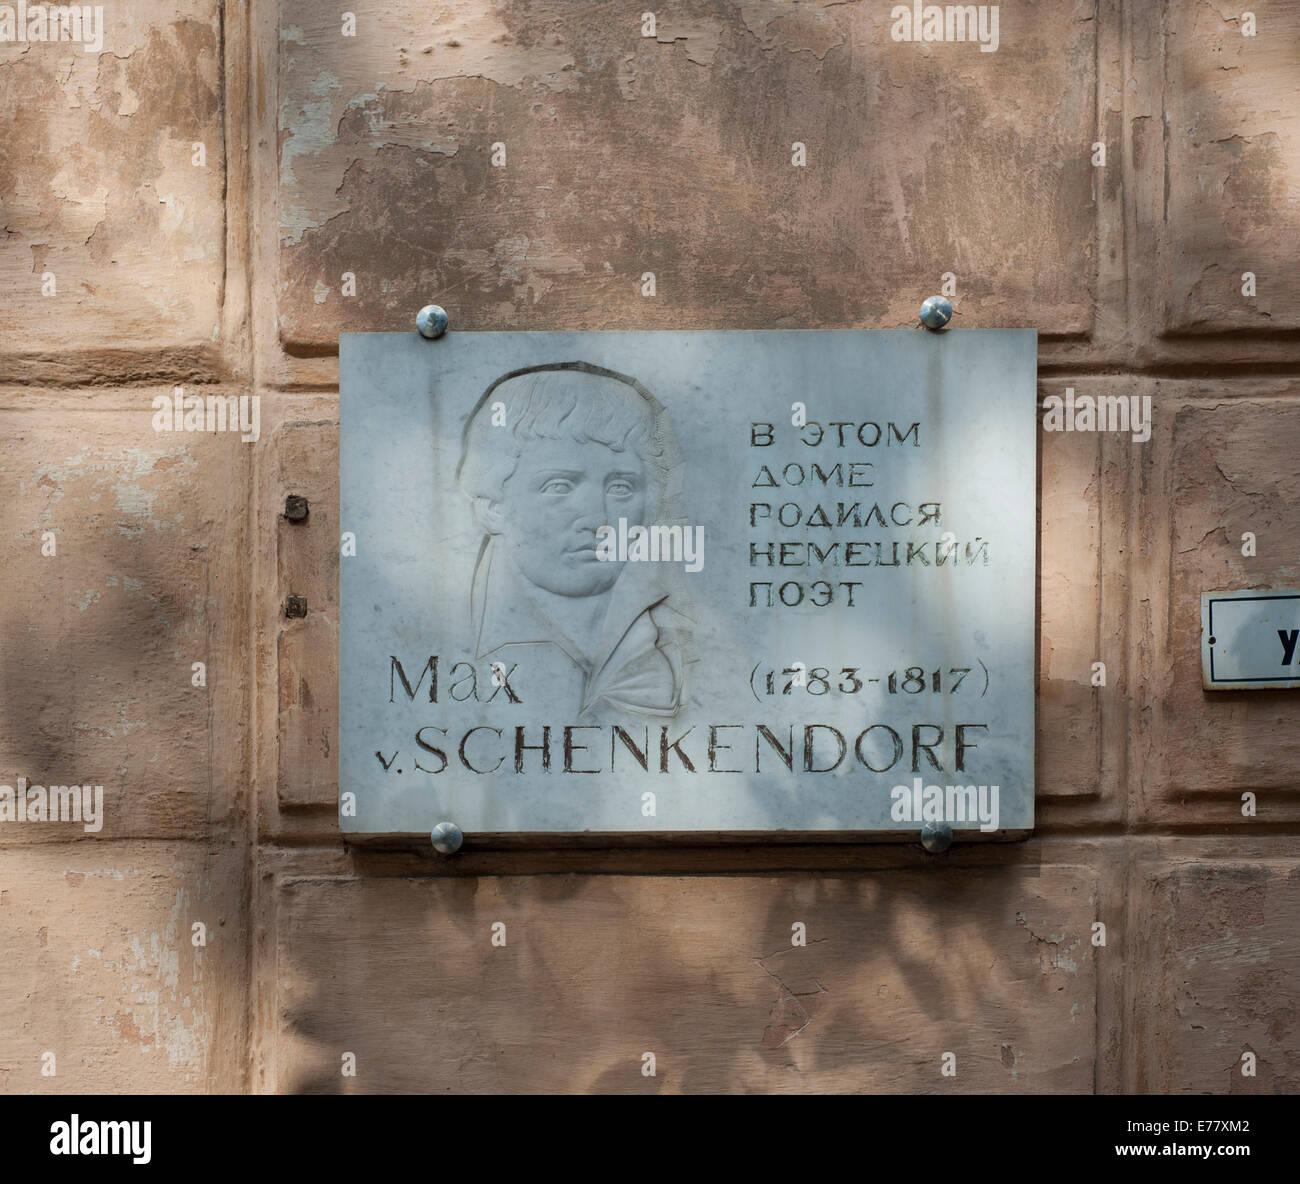 Memorial plaque to the poet Max von Schenkendorf, at his birthplace, Tilsit, Sovetsk, Kaliningrad Oblast, Russia - Stock Image